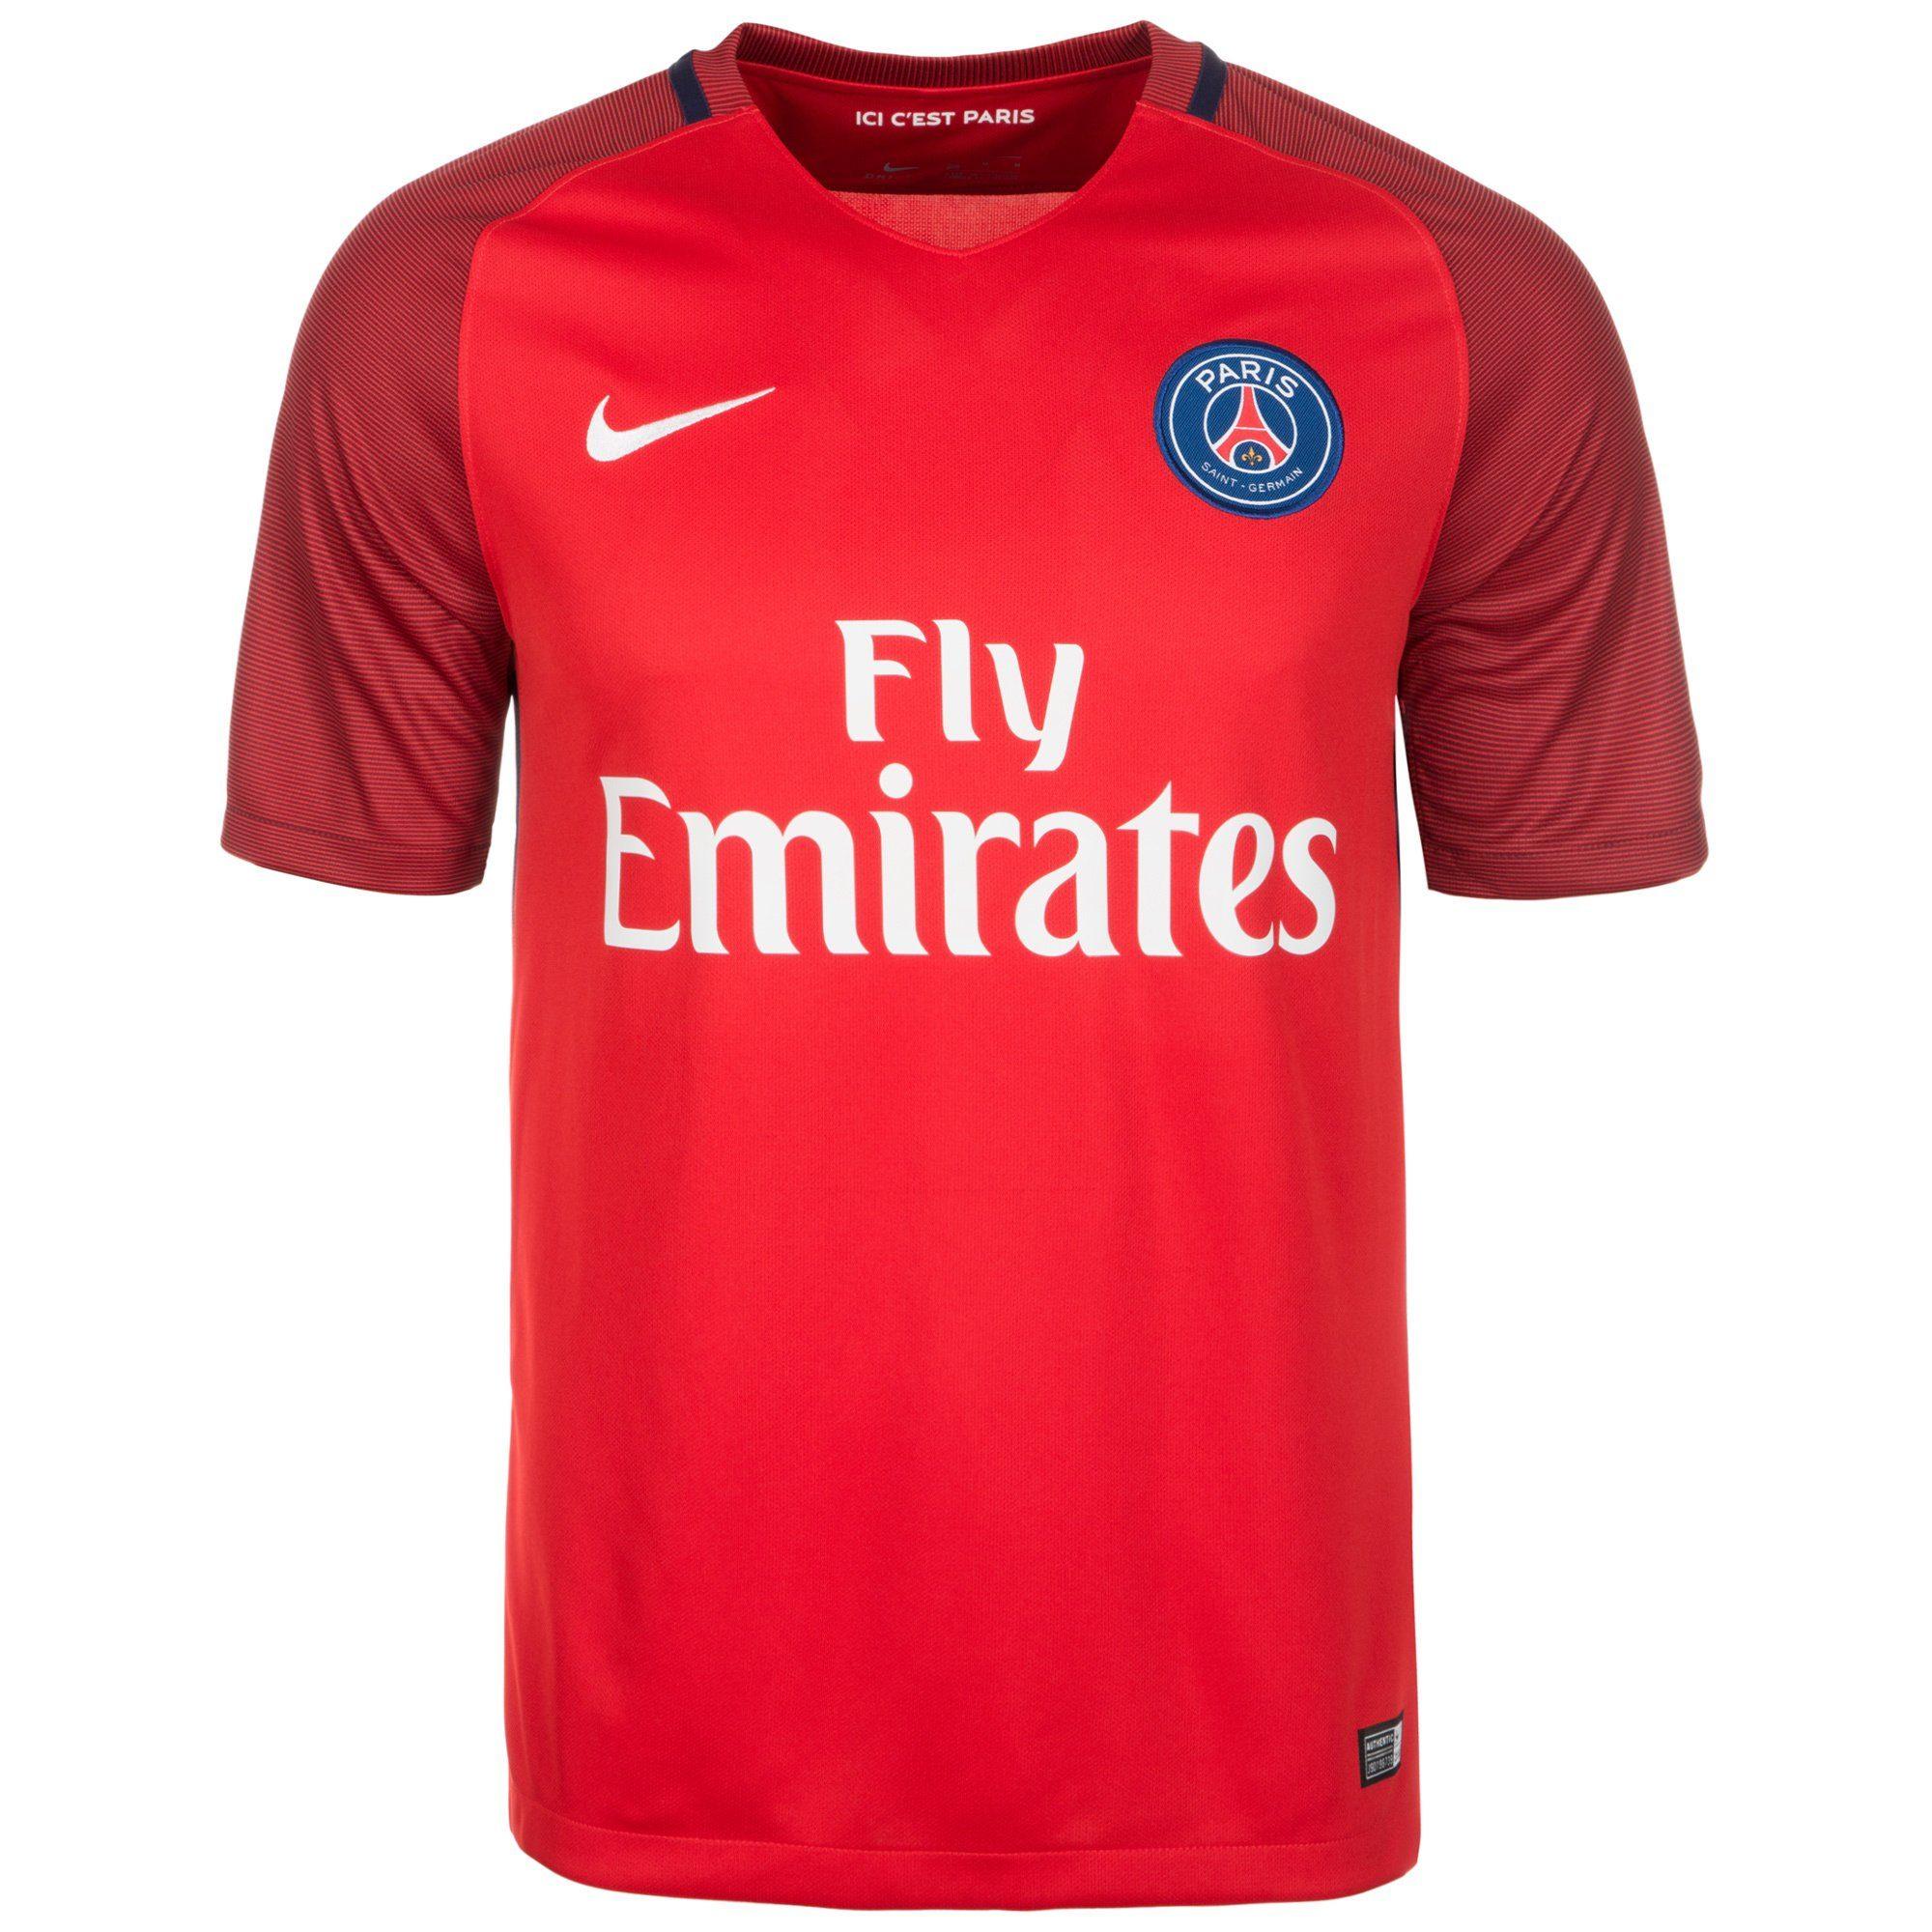 Nike Fußballtrikot Paris Saint-germain 16/17 Auswärts | Sportbekleidung > Trikots | Rot | Ab | Nike